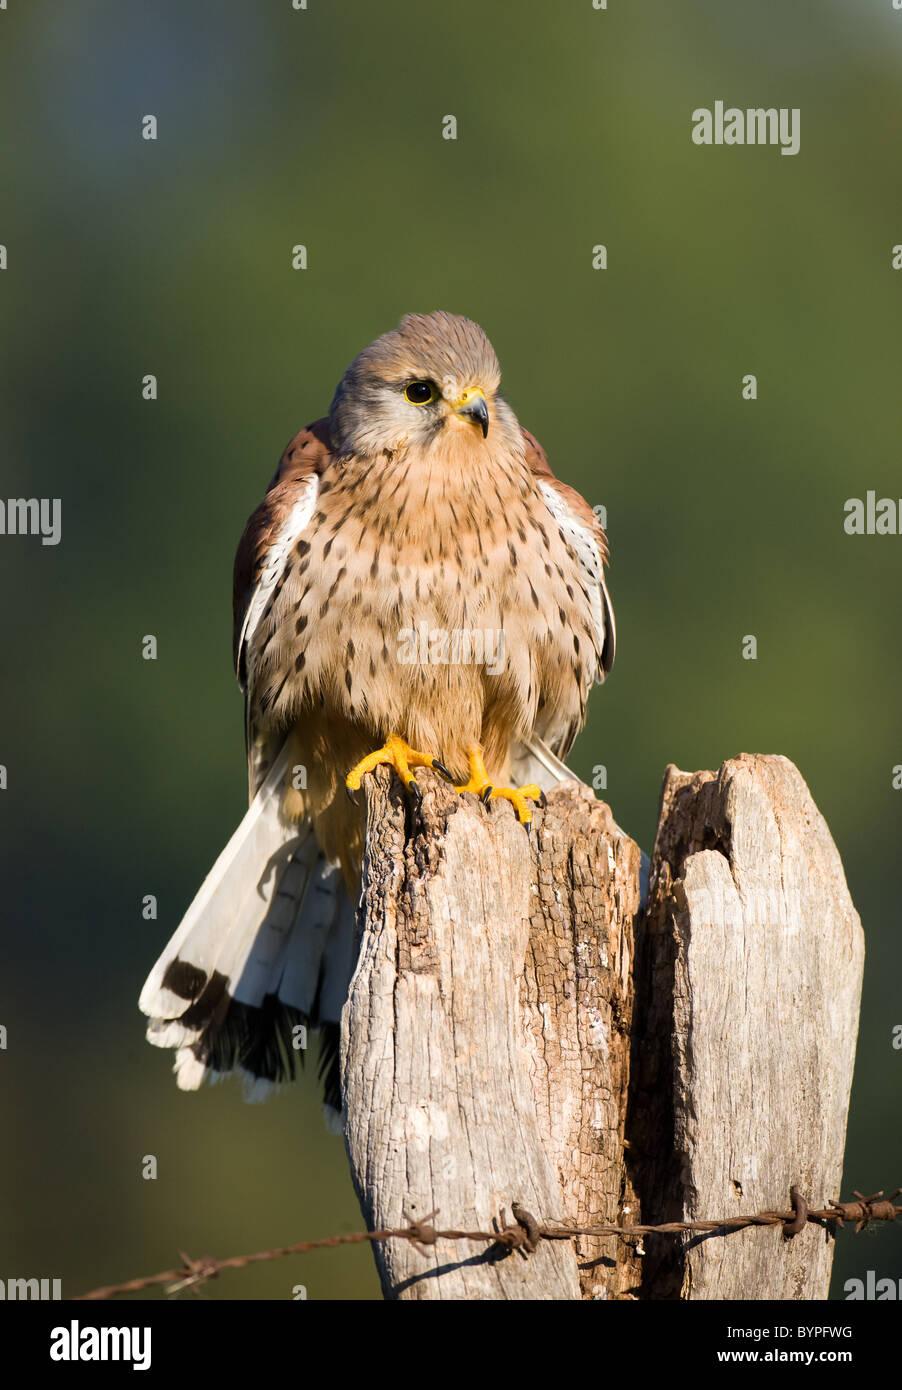 common eurasian kestrel [Falco tinnunculus] germany - Stock Image